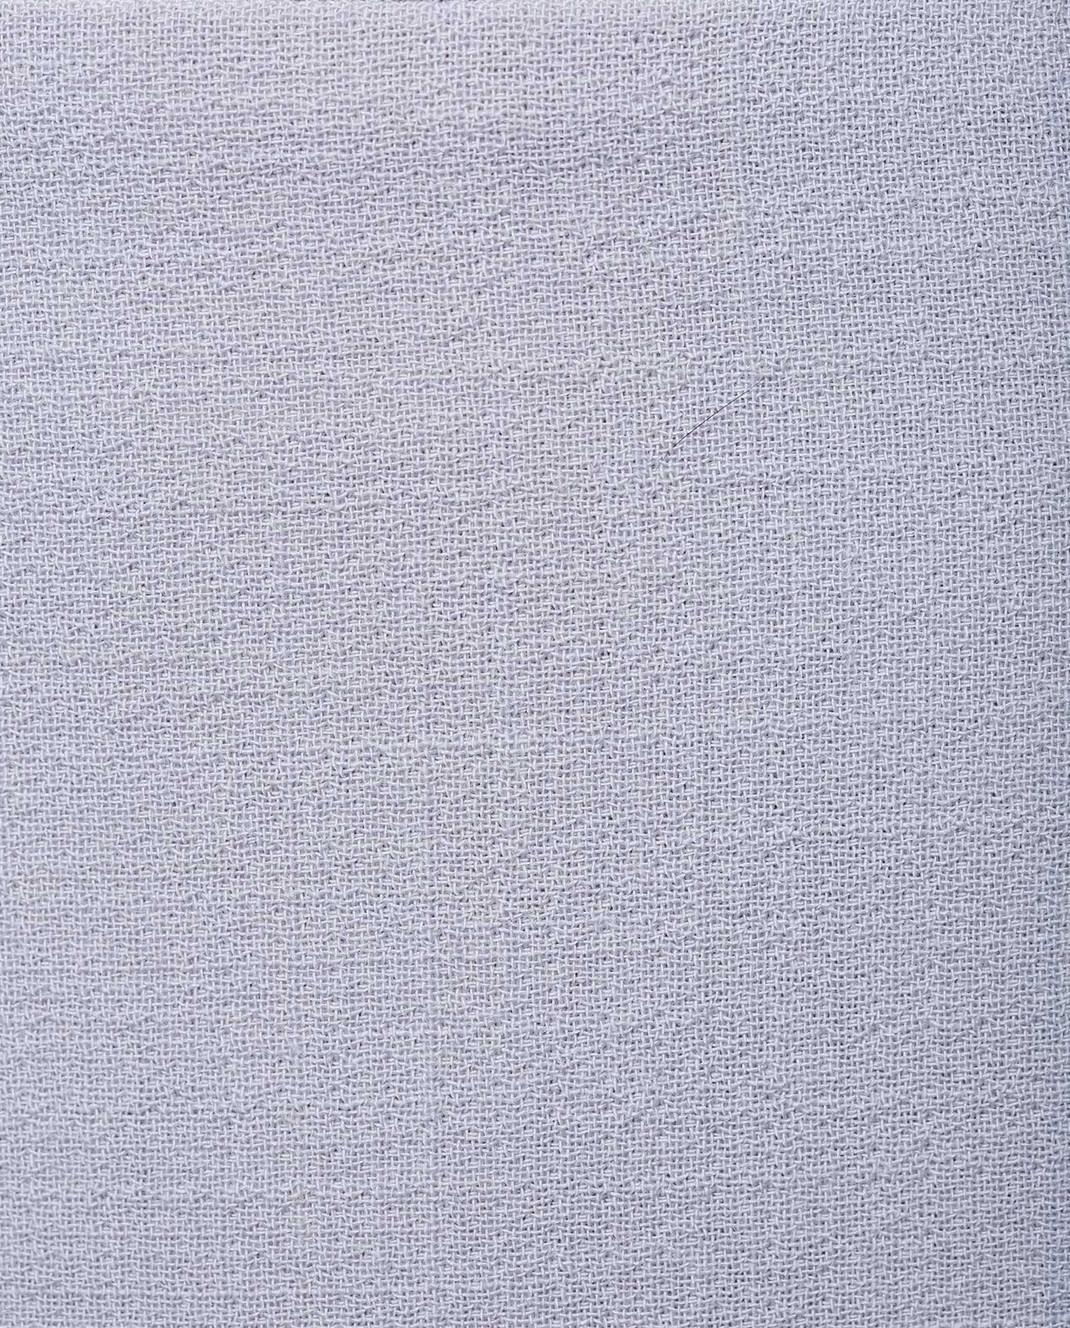 A la Russe Светло-серая юбка 371004 изображение 5